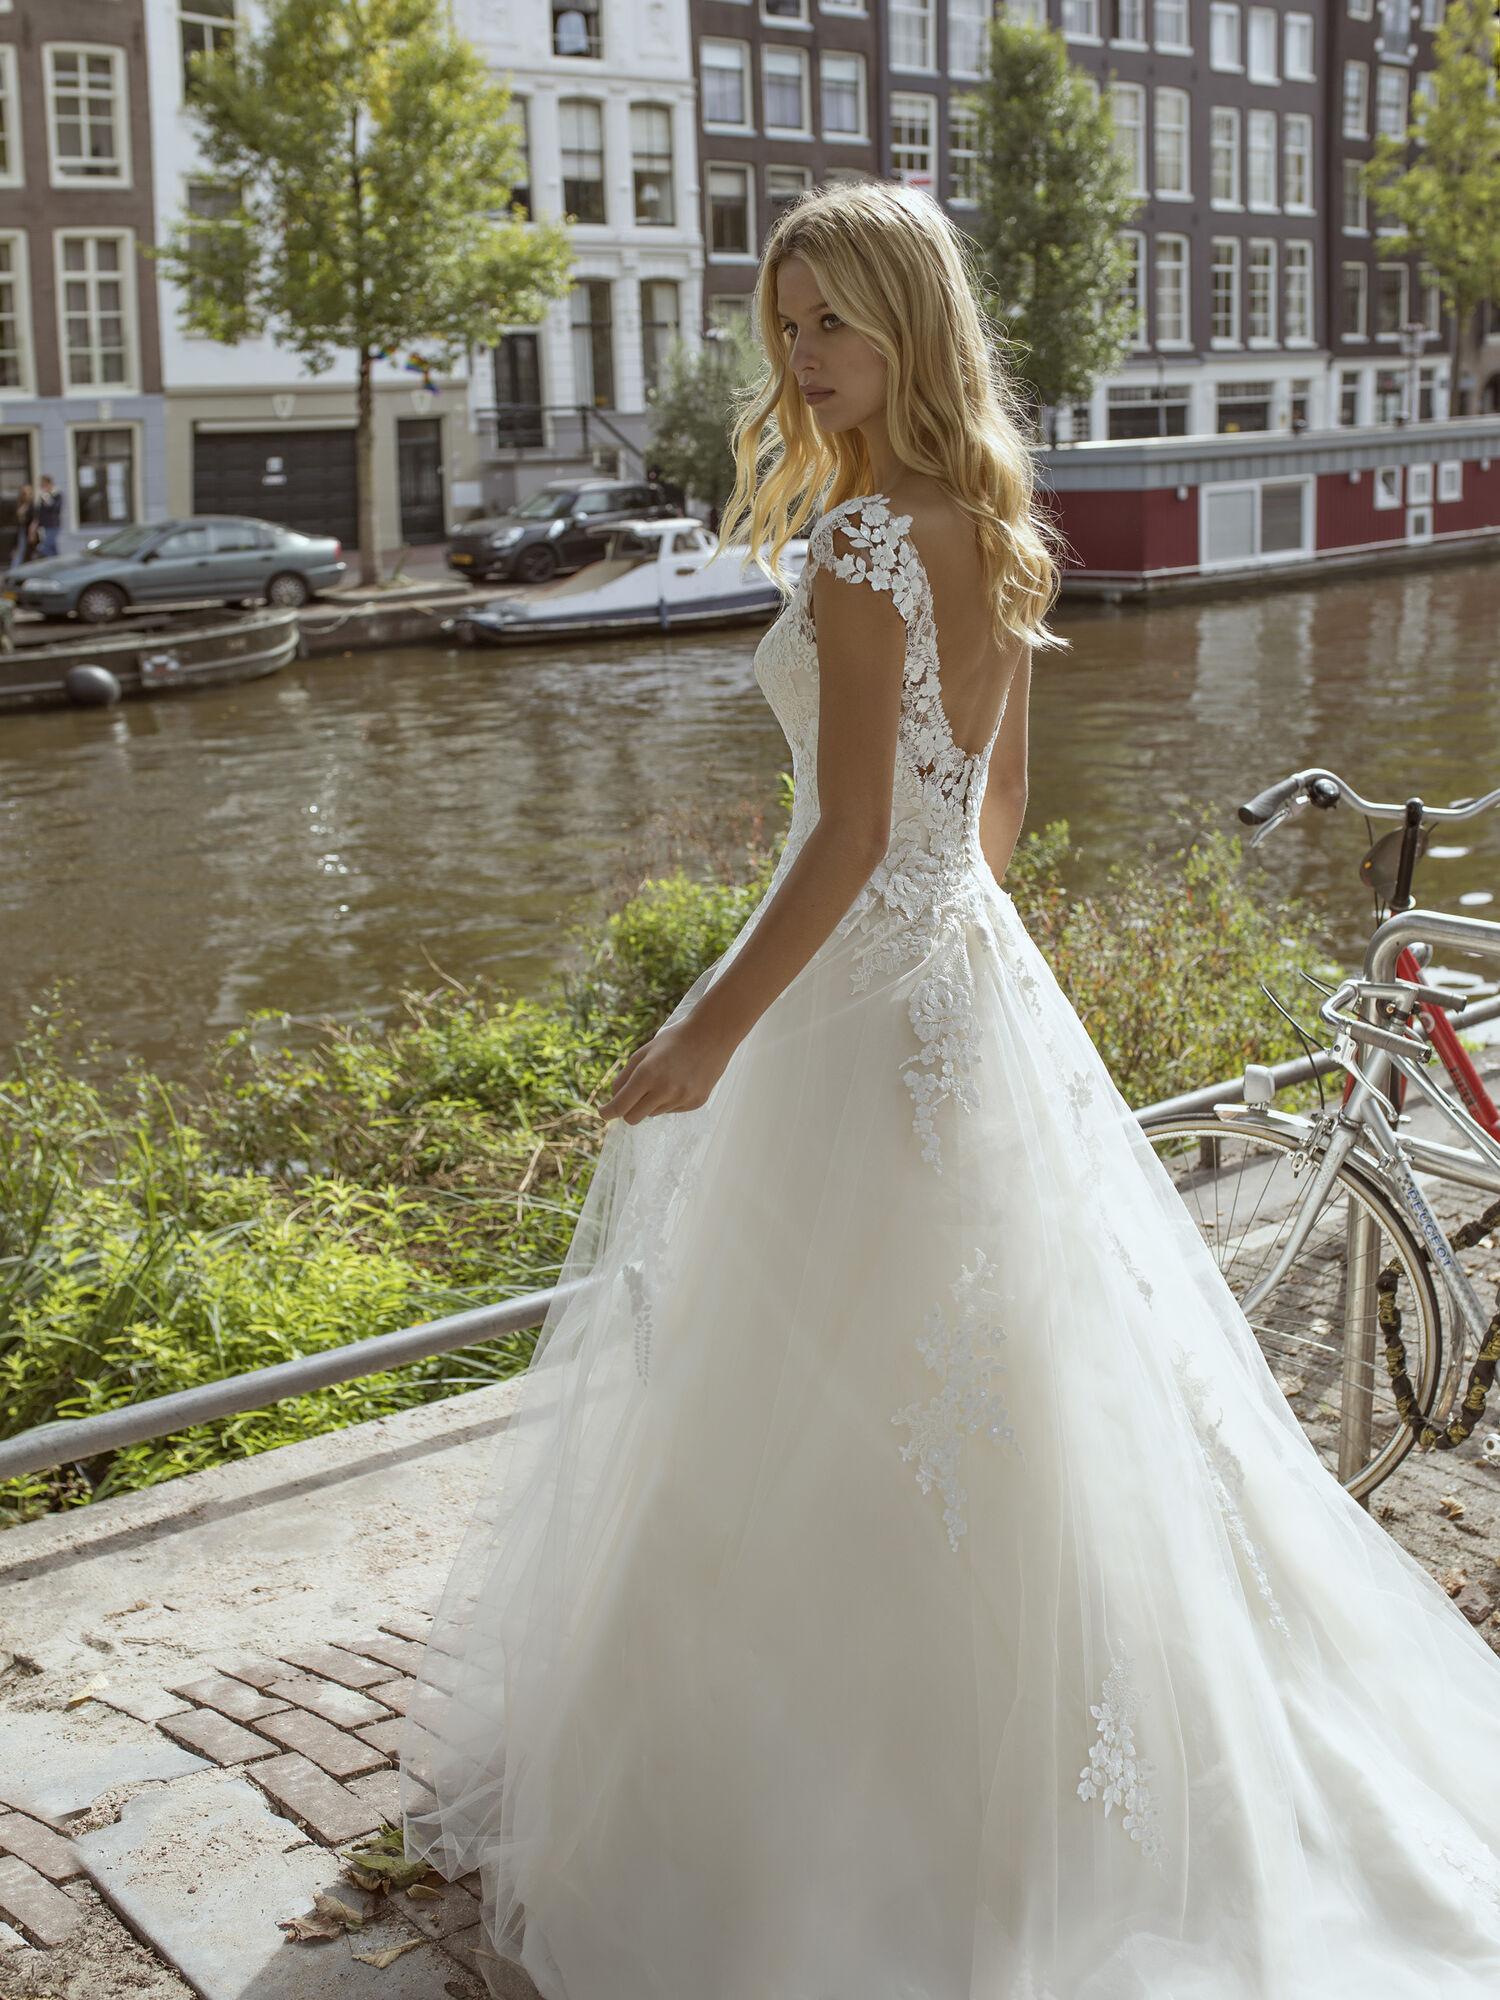 robe de mariée toulon, robe de mariee var,